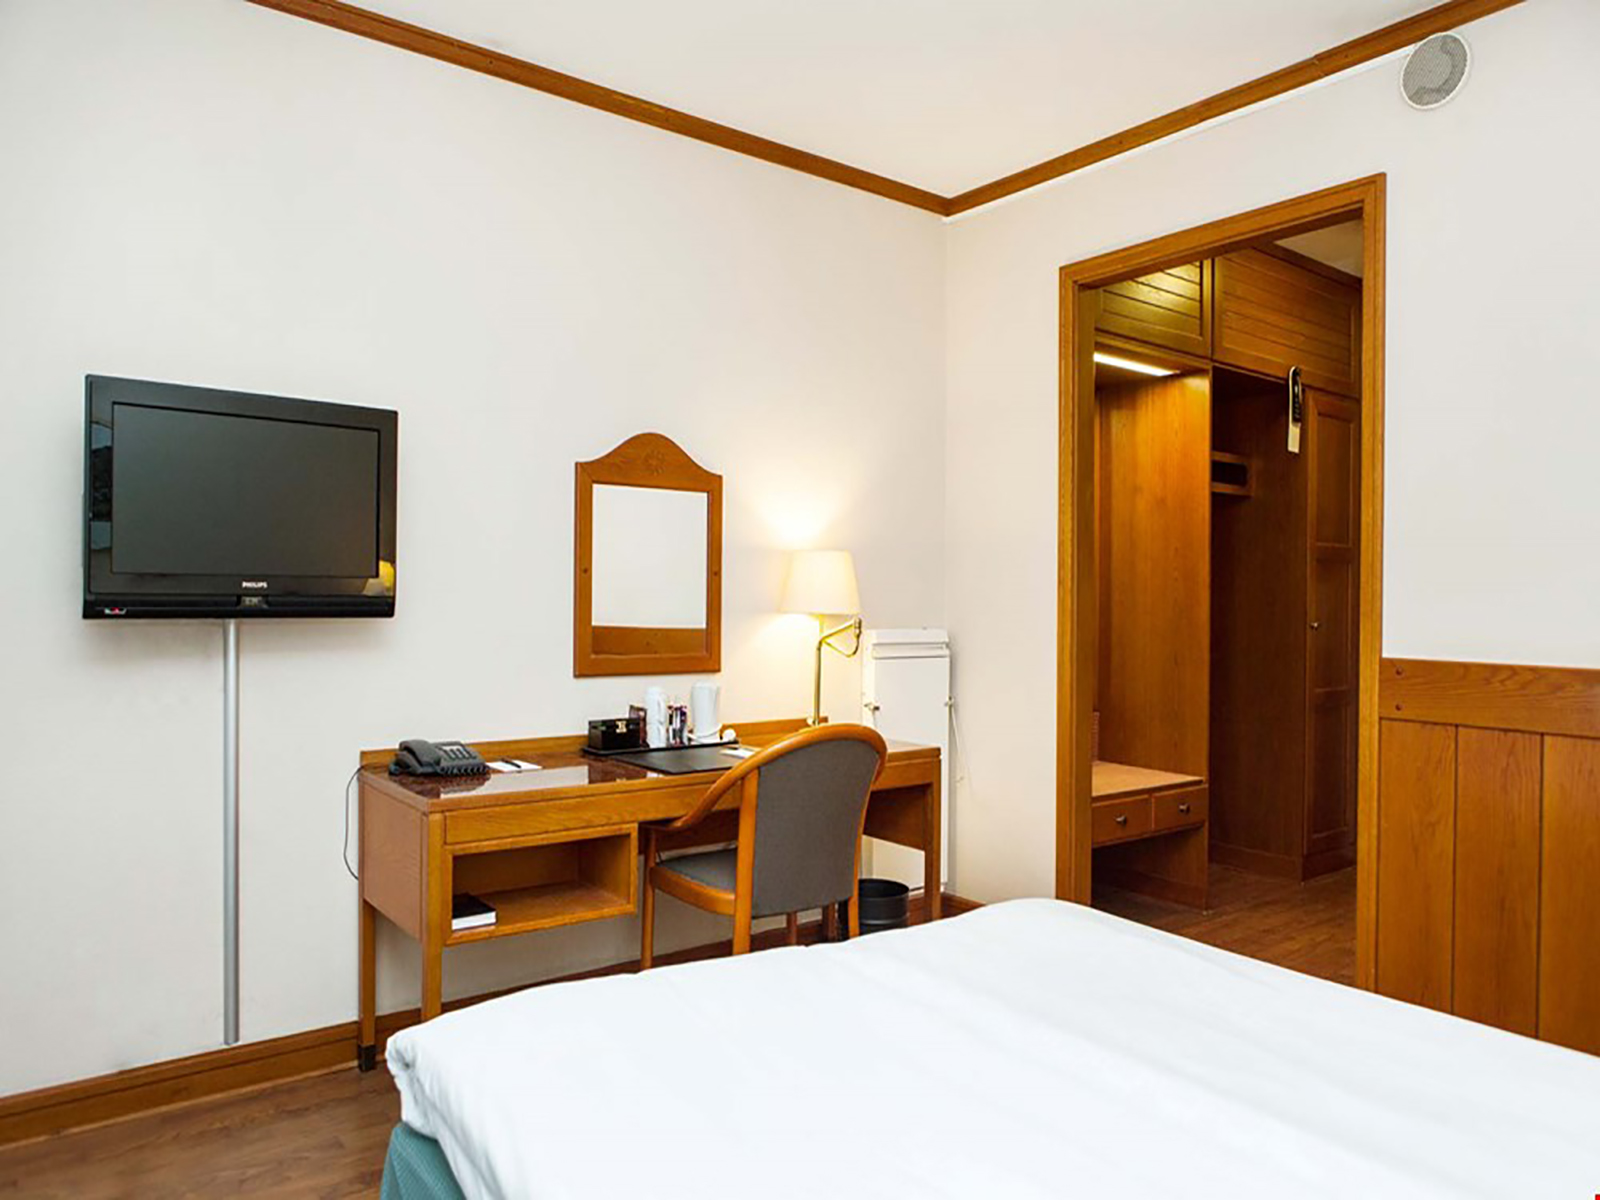 anmeldelser thai massage hotel timebasis københavn